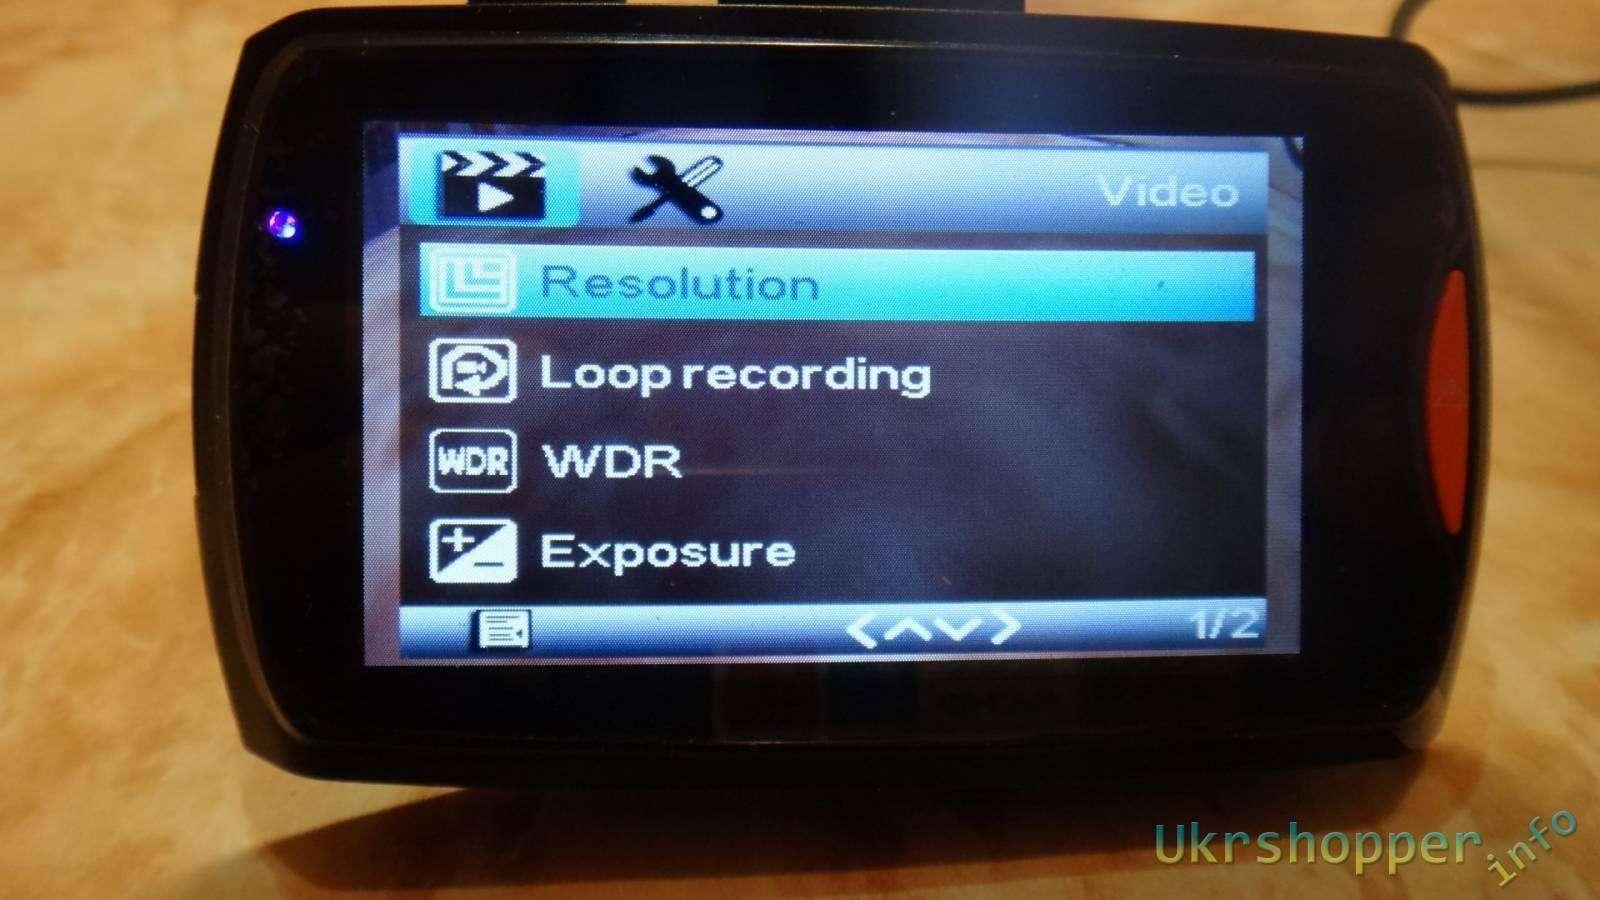 EachBuyer: Отличный видео регистартор Blackbox DVR для автомобиля Full HD 1080P с дисплеем и G-сенсором